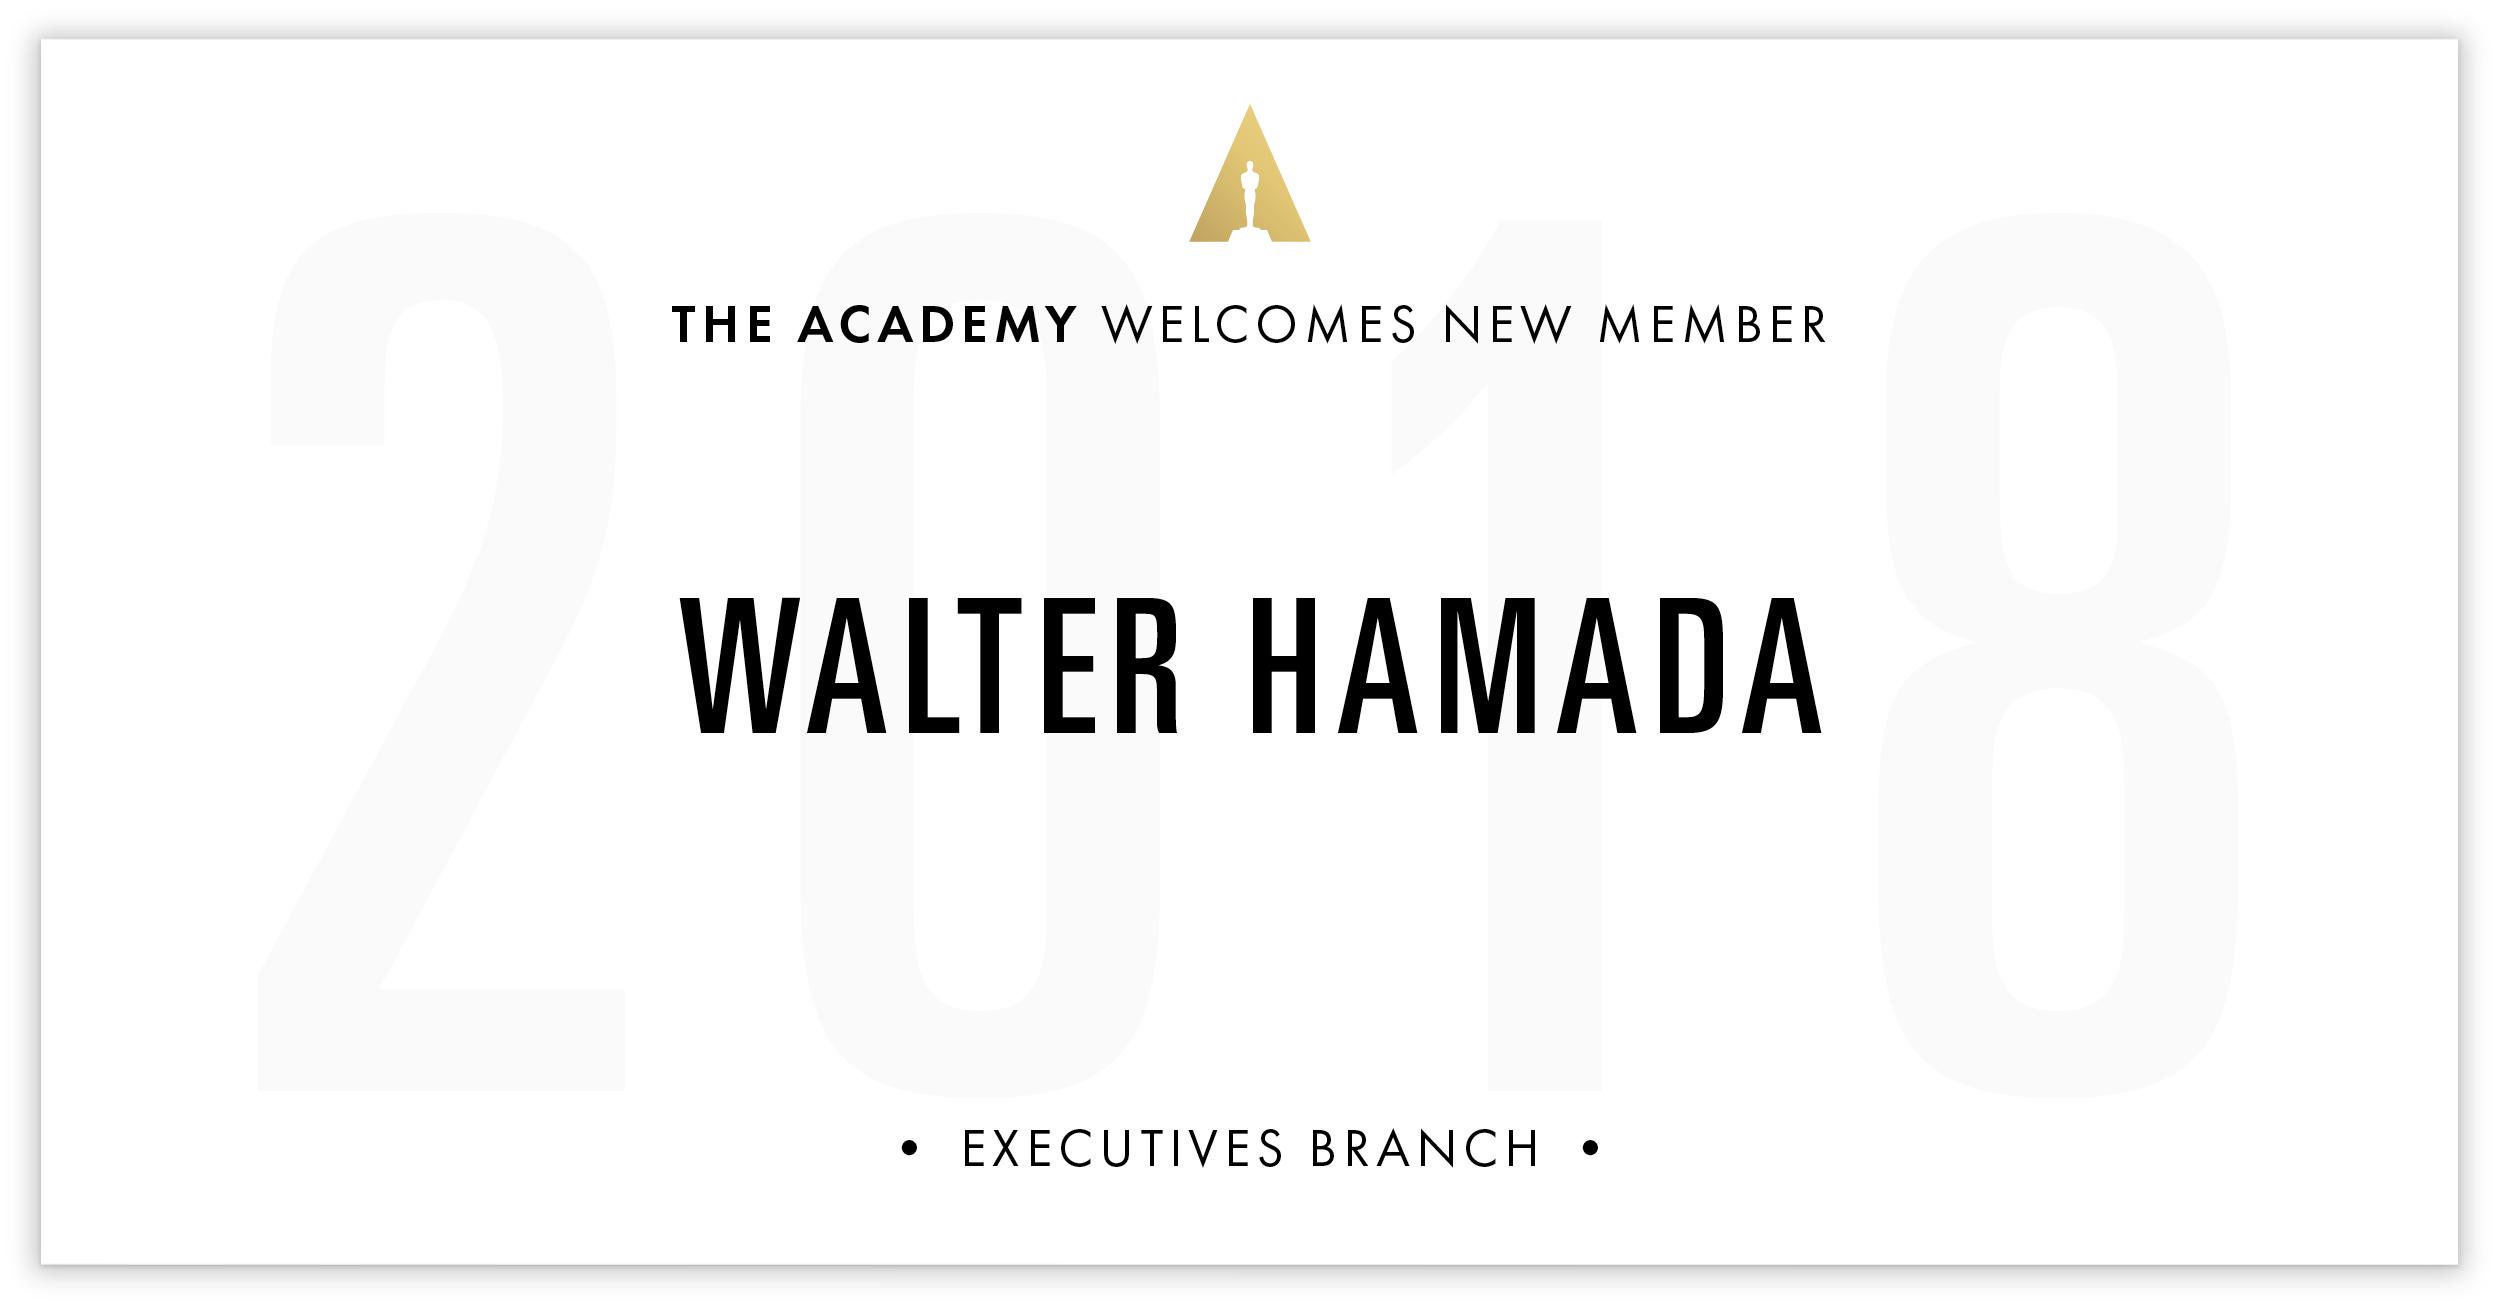 Walter Hamada is invited!